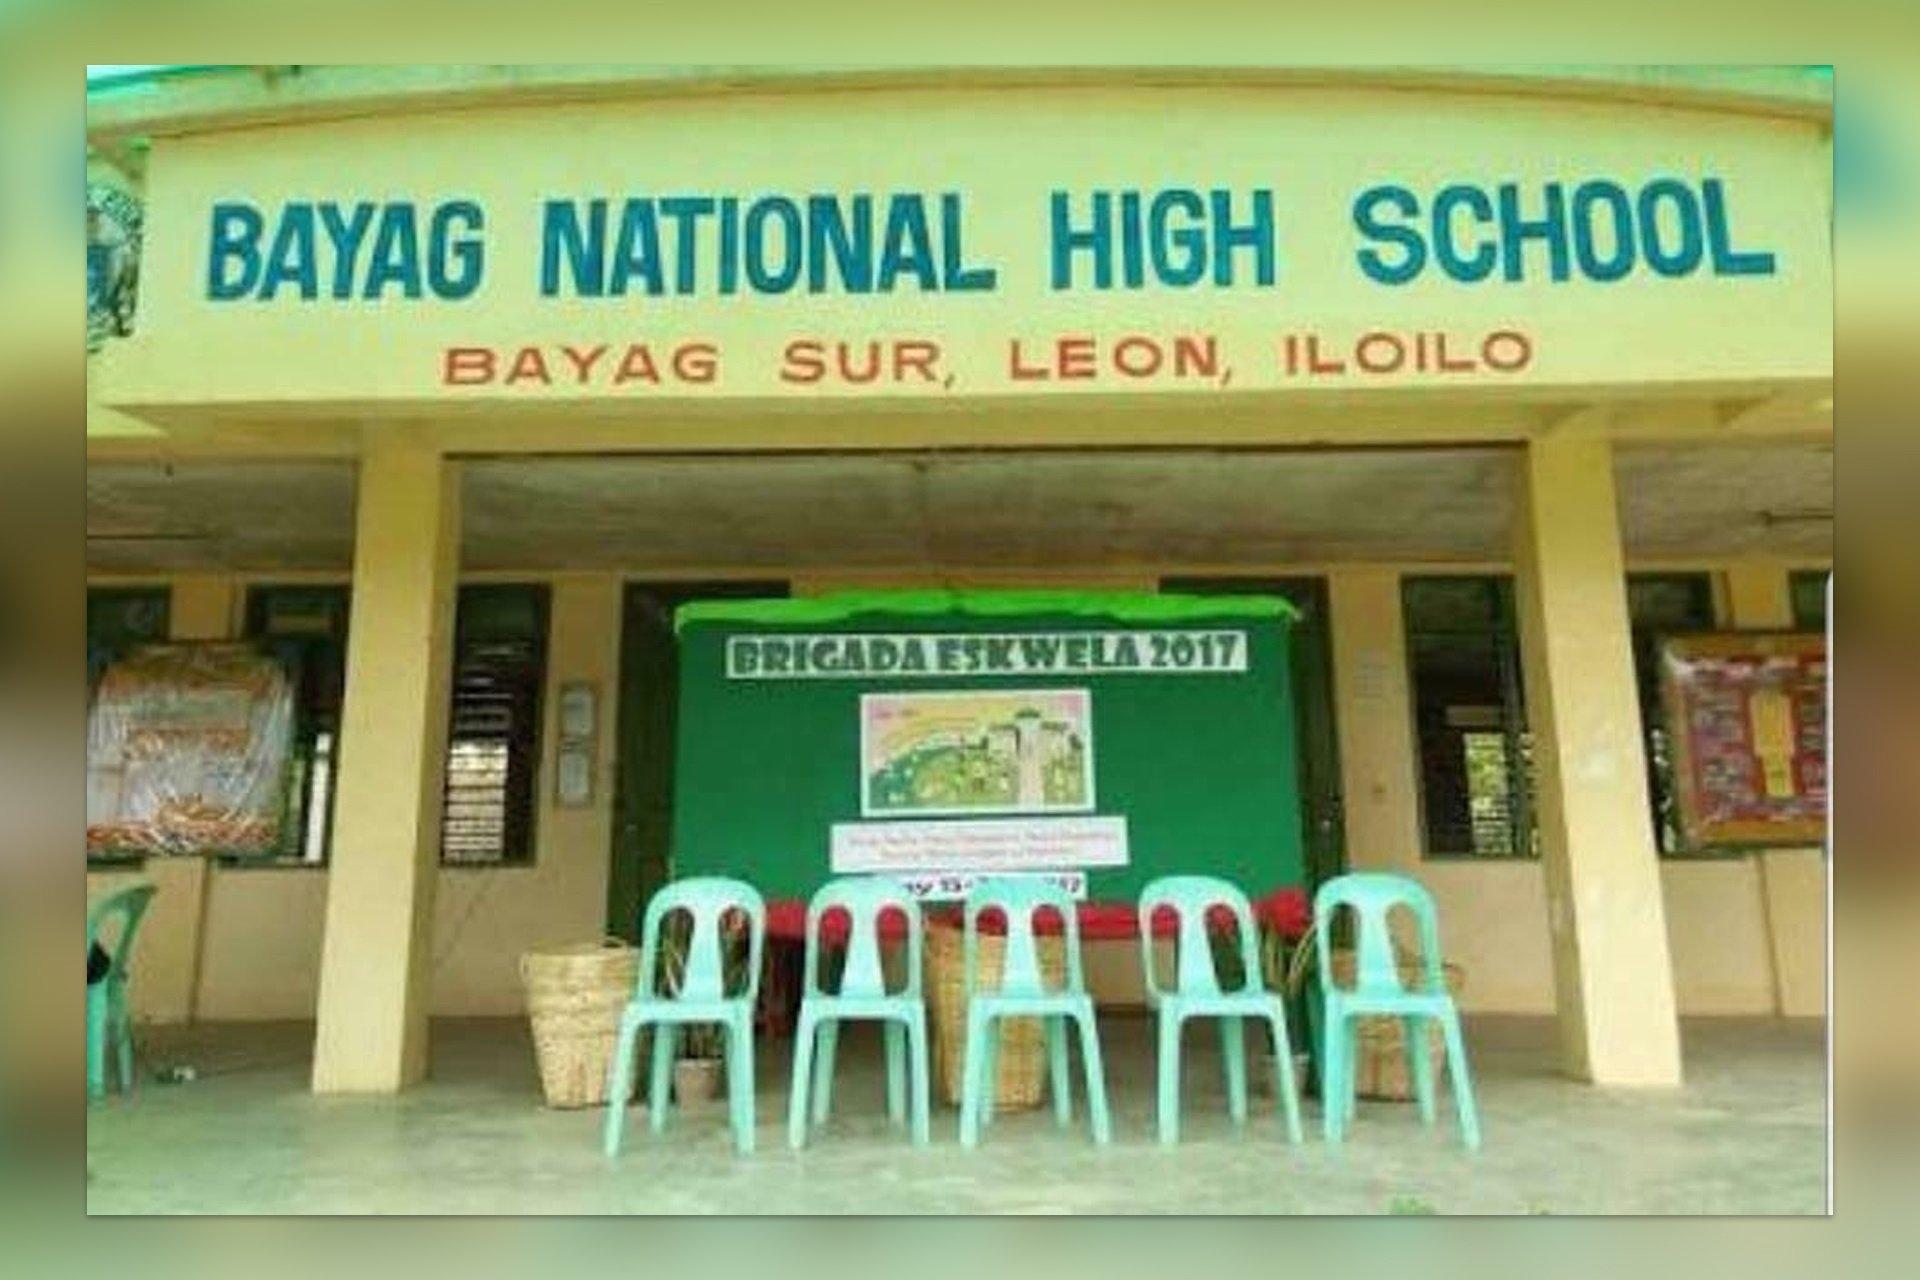 Bayag National High School